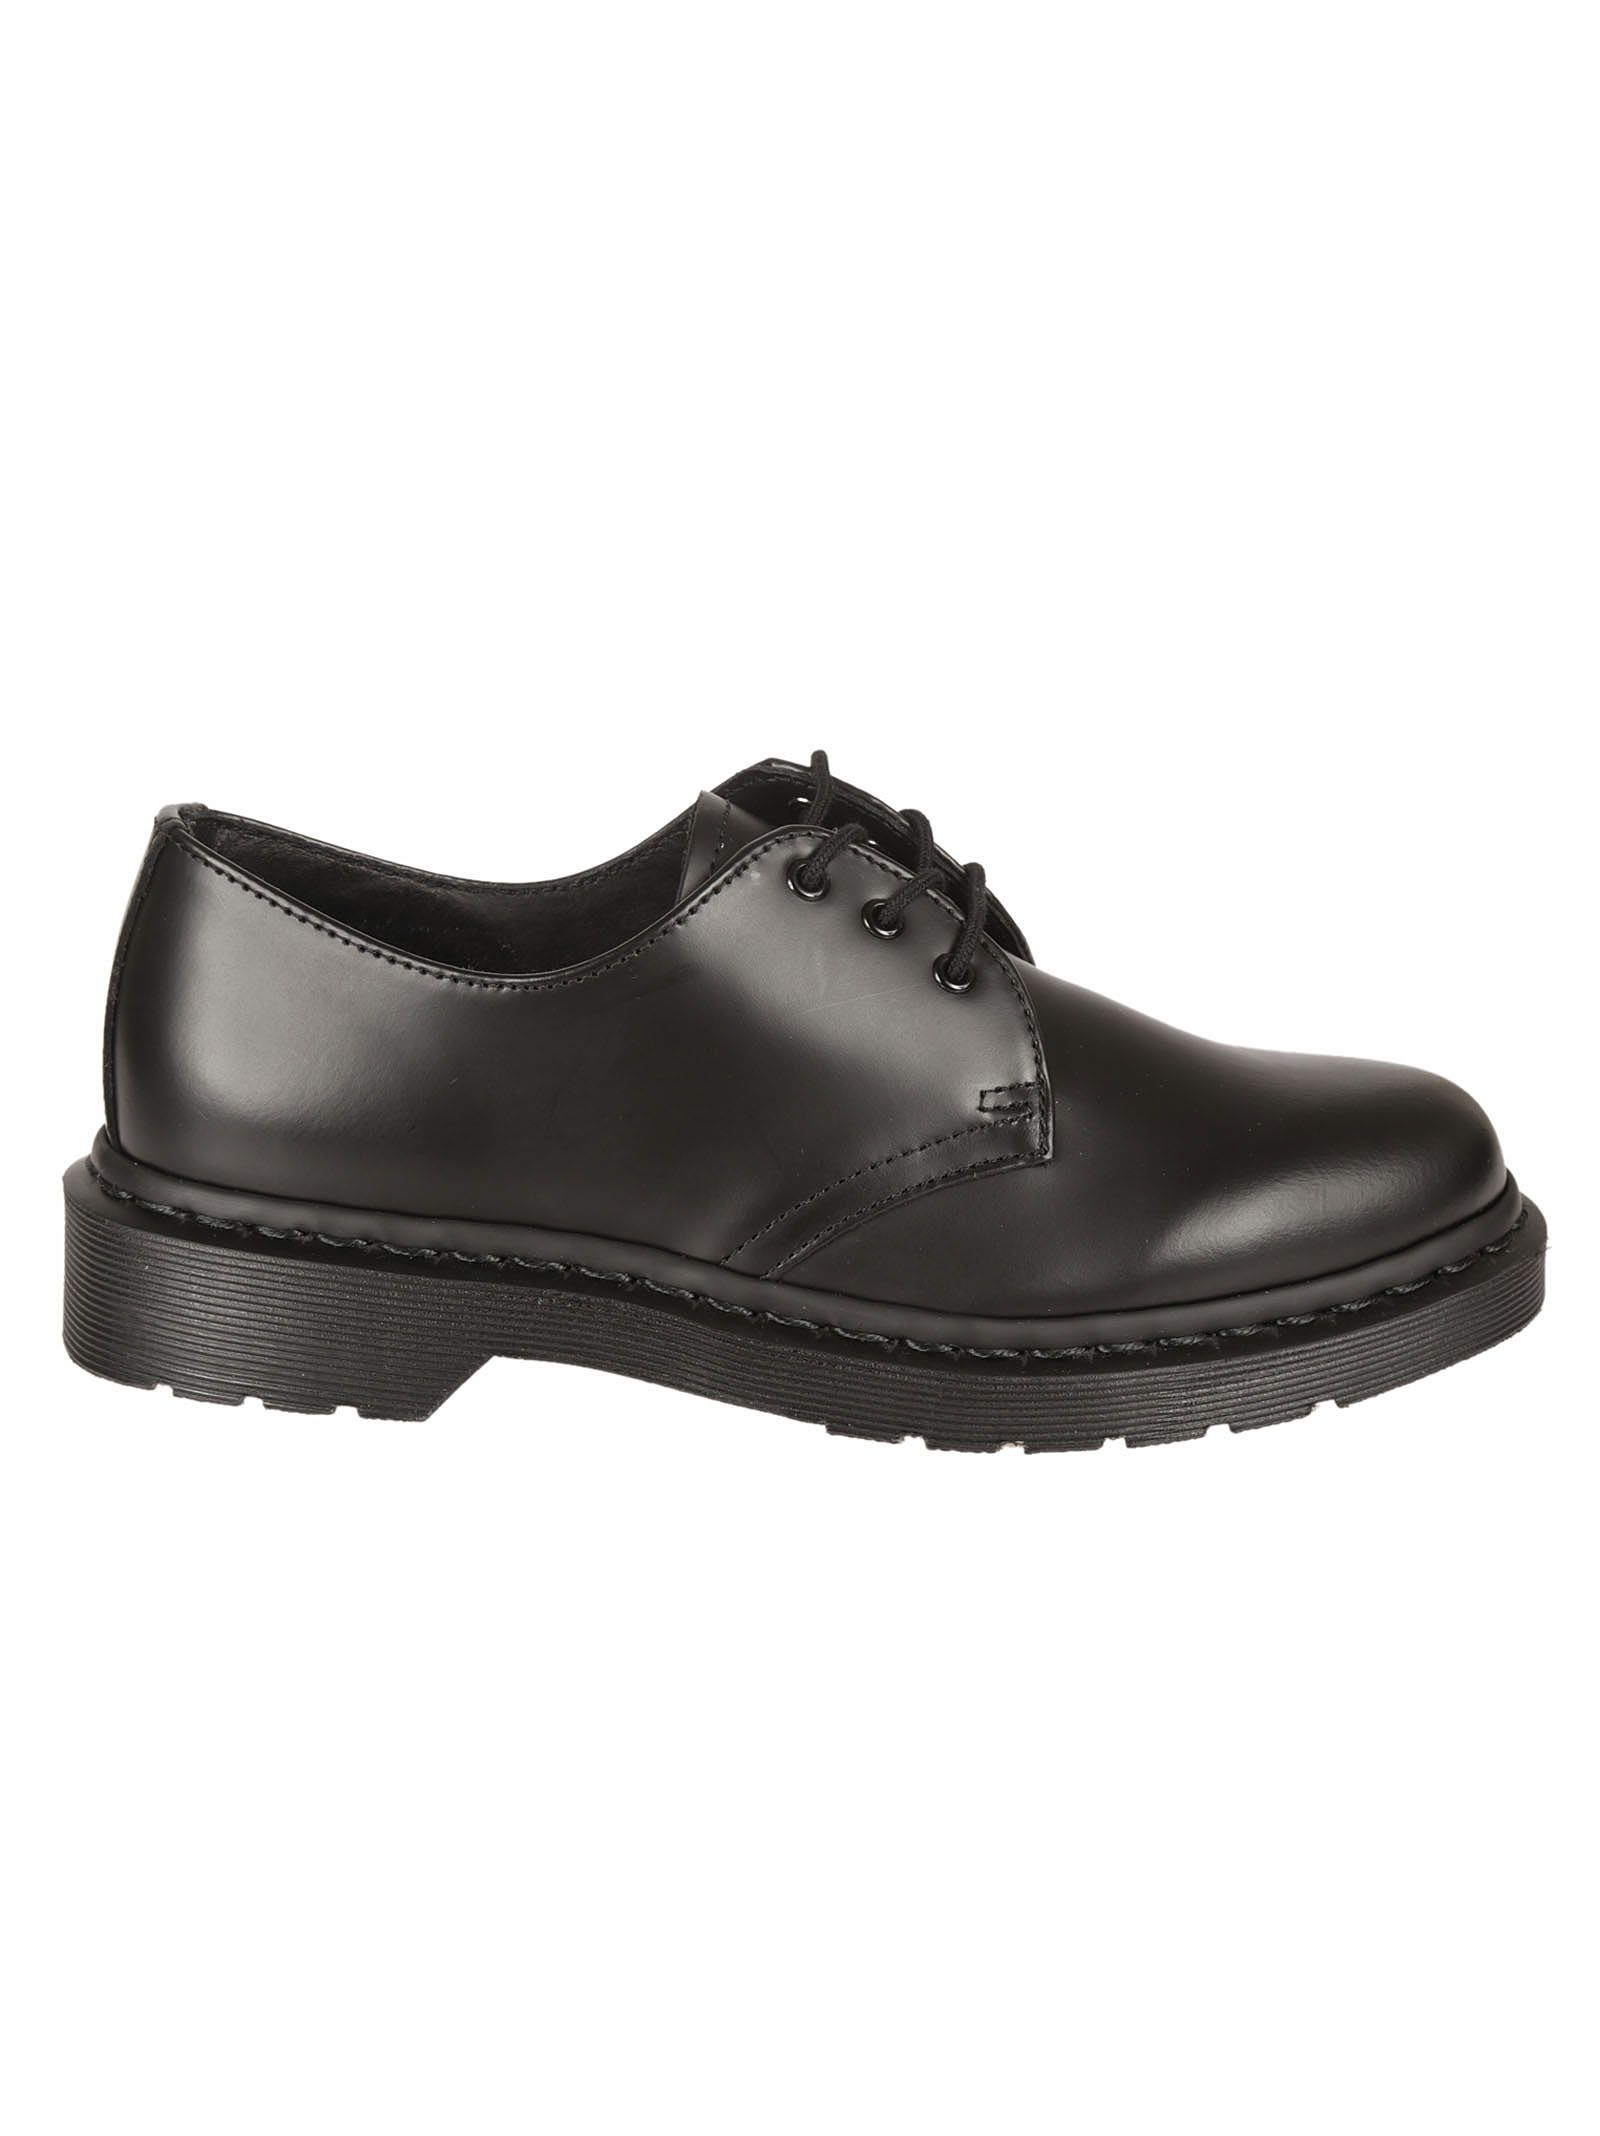 dr martens female black 1461 derby shoes